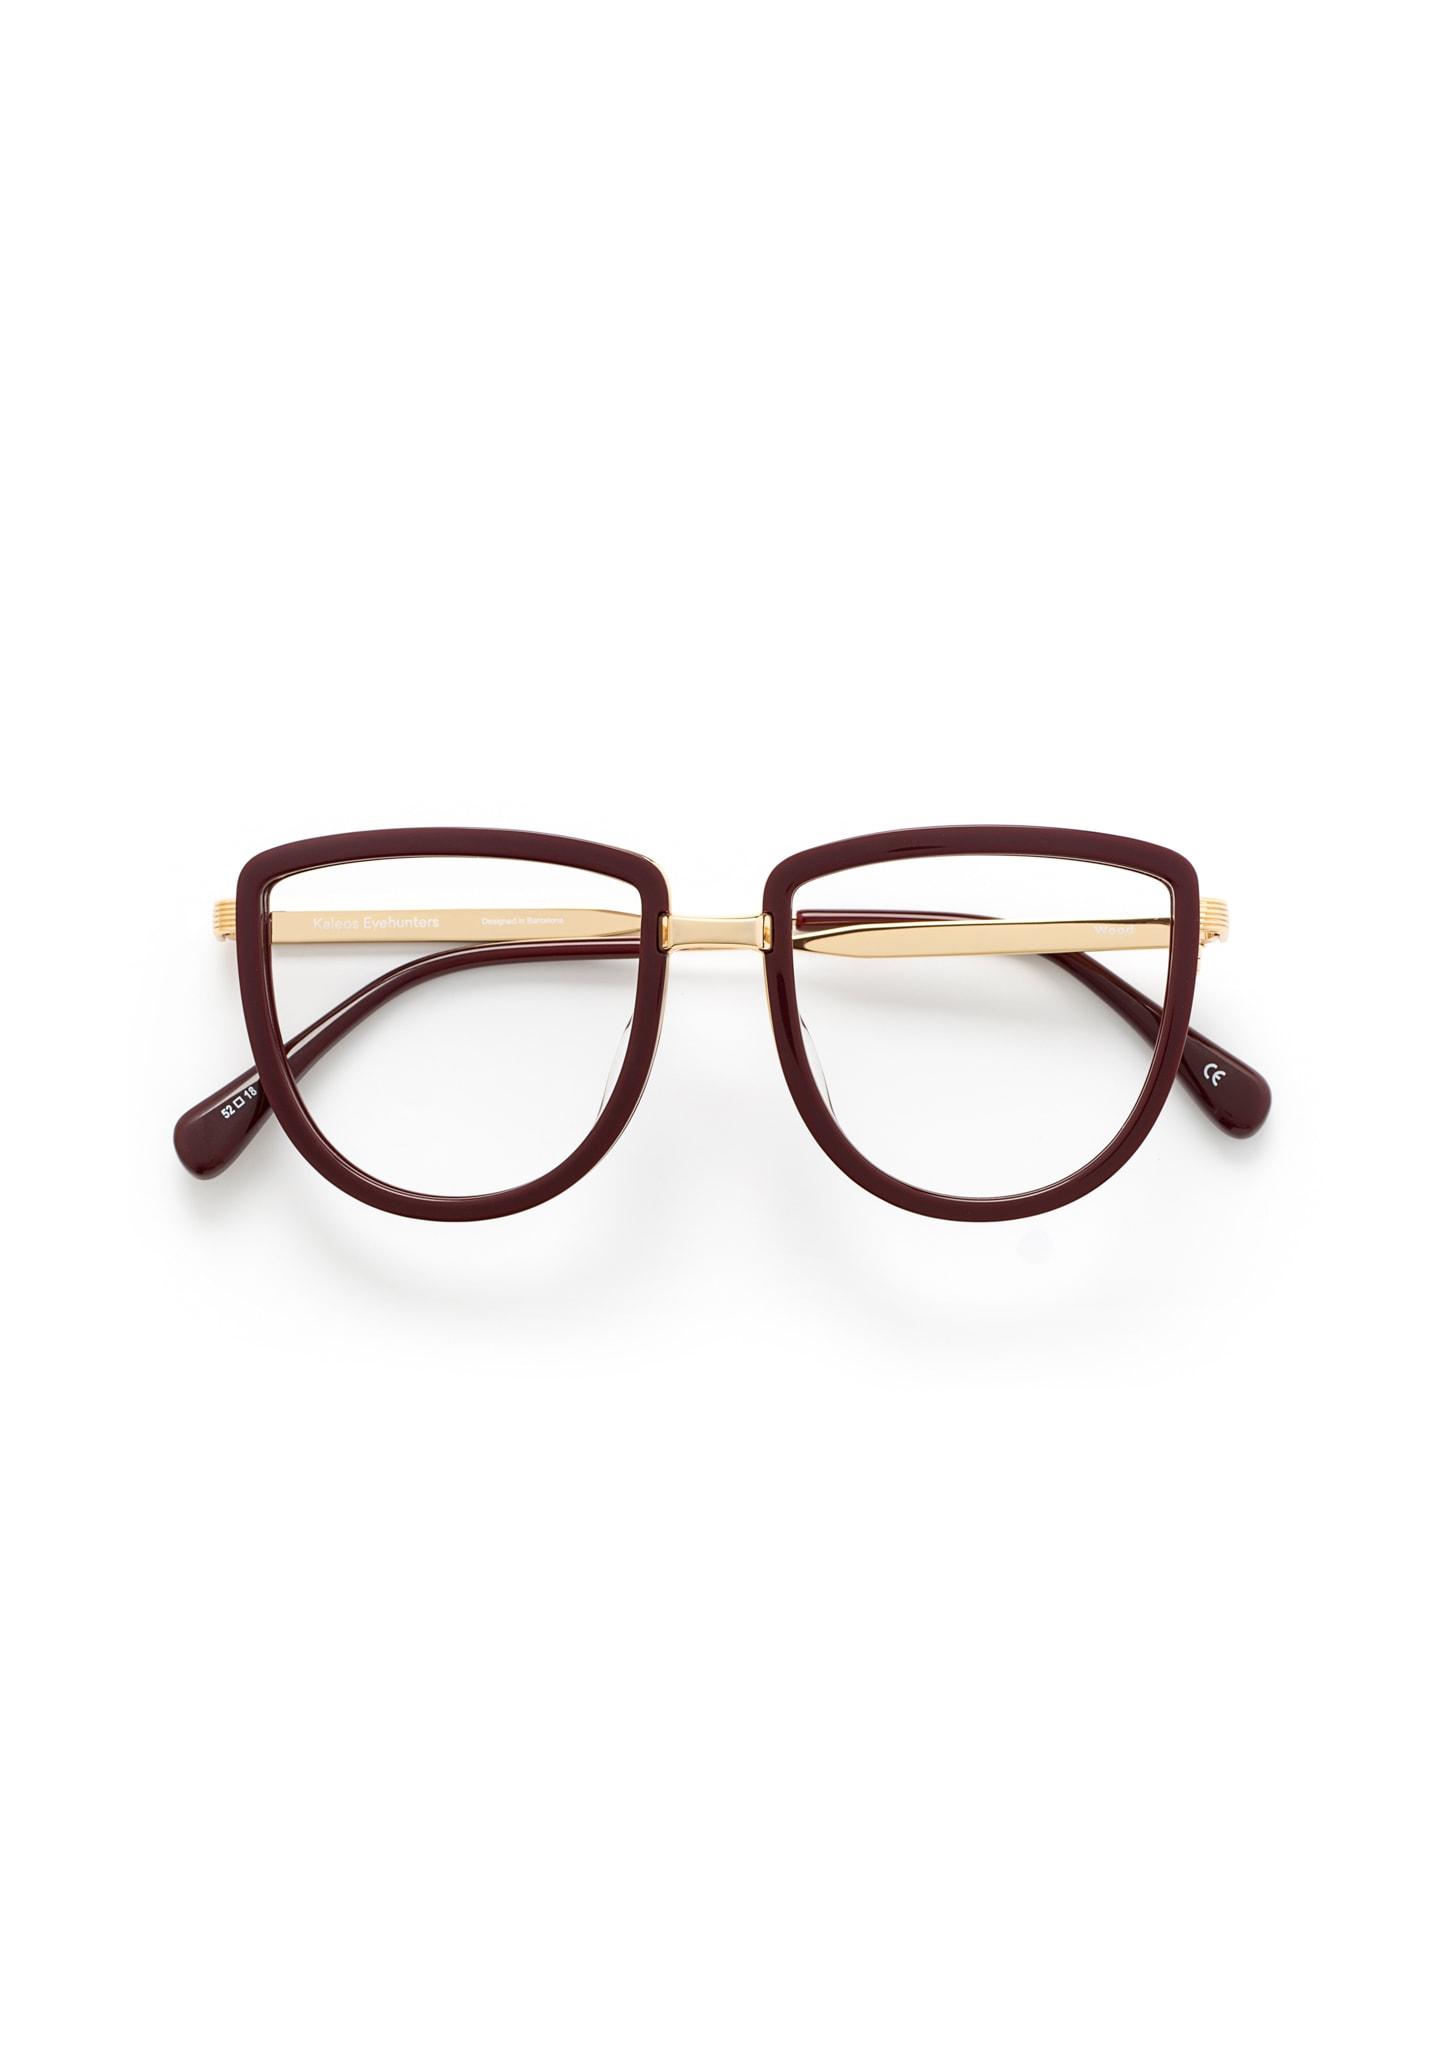 Gafas Wood Color 2